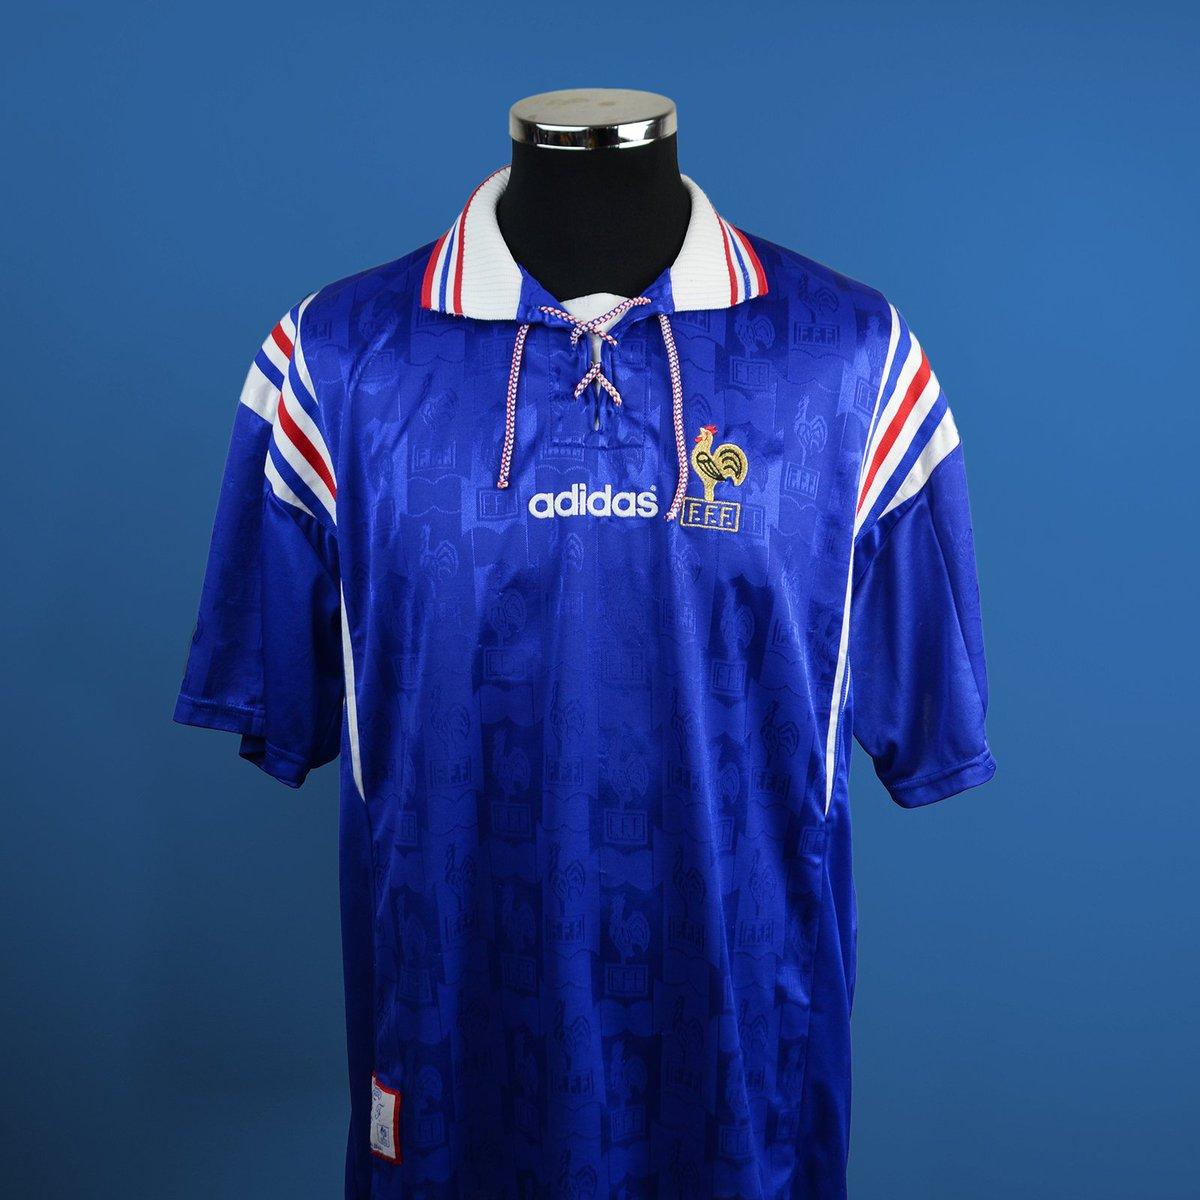 f2418c13e70 Classic Football Shirts on Twitter: